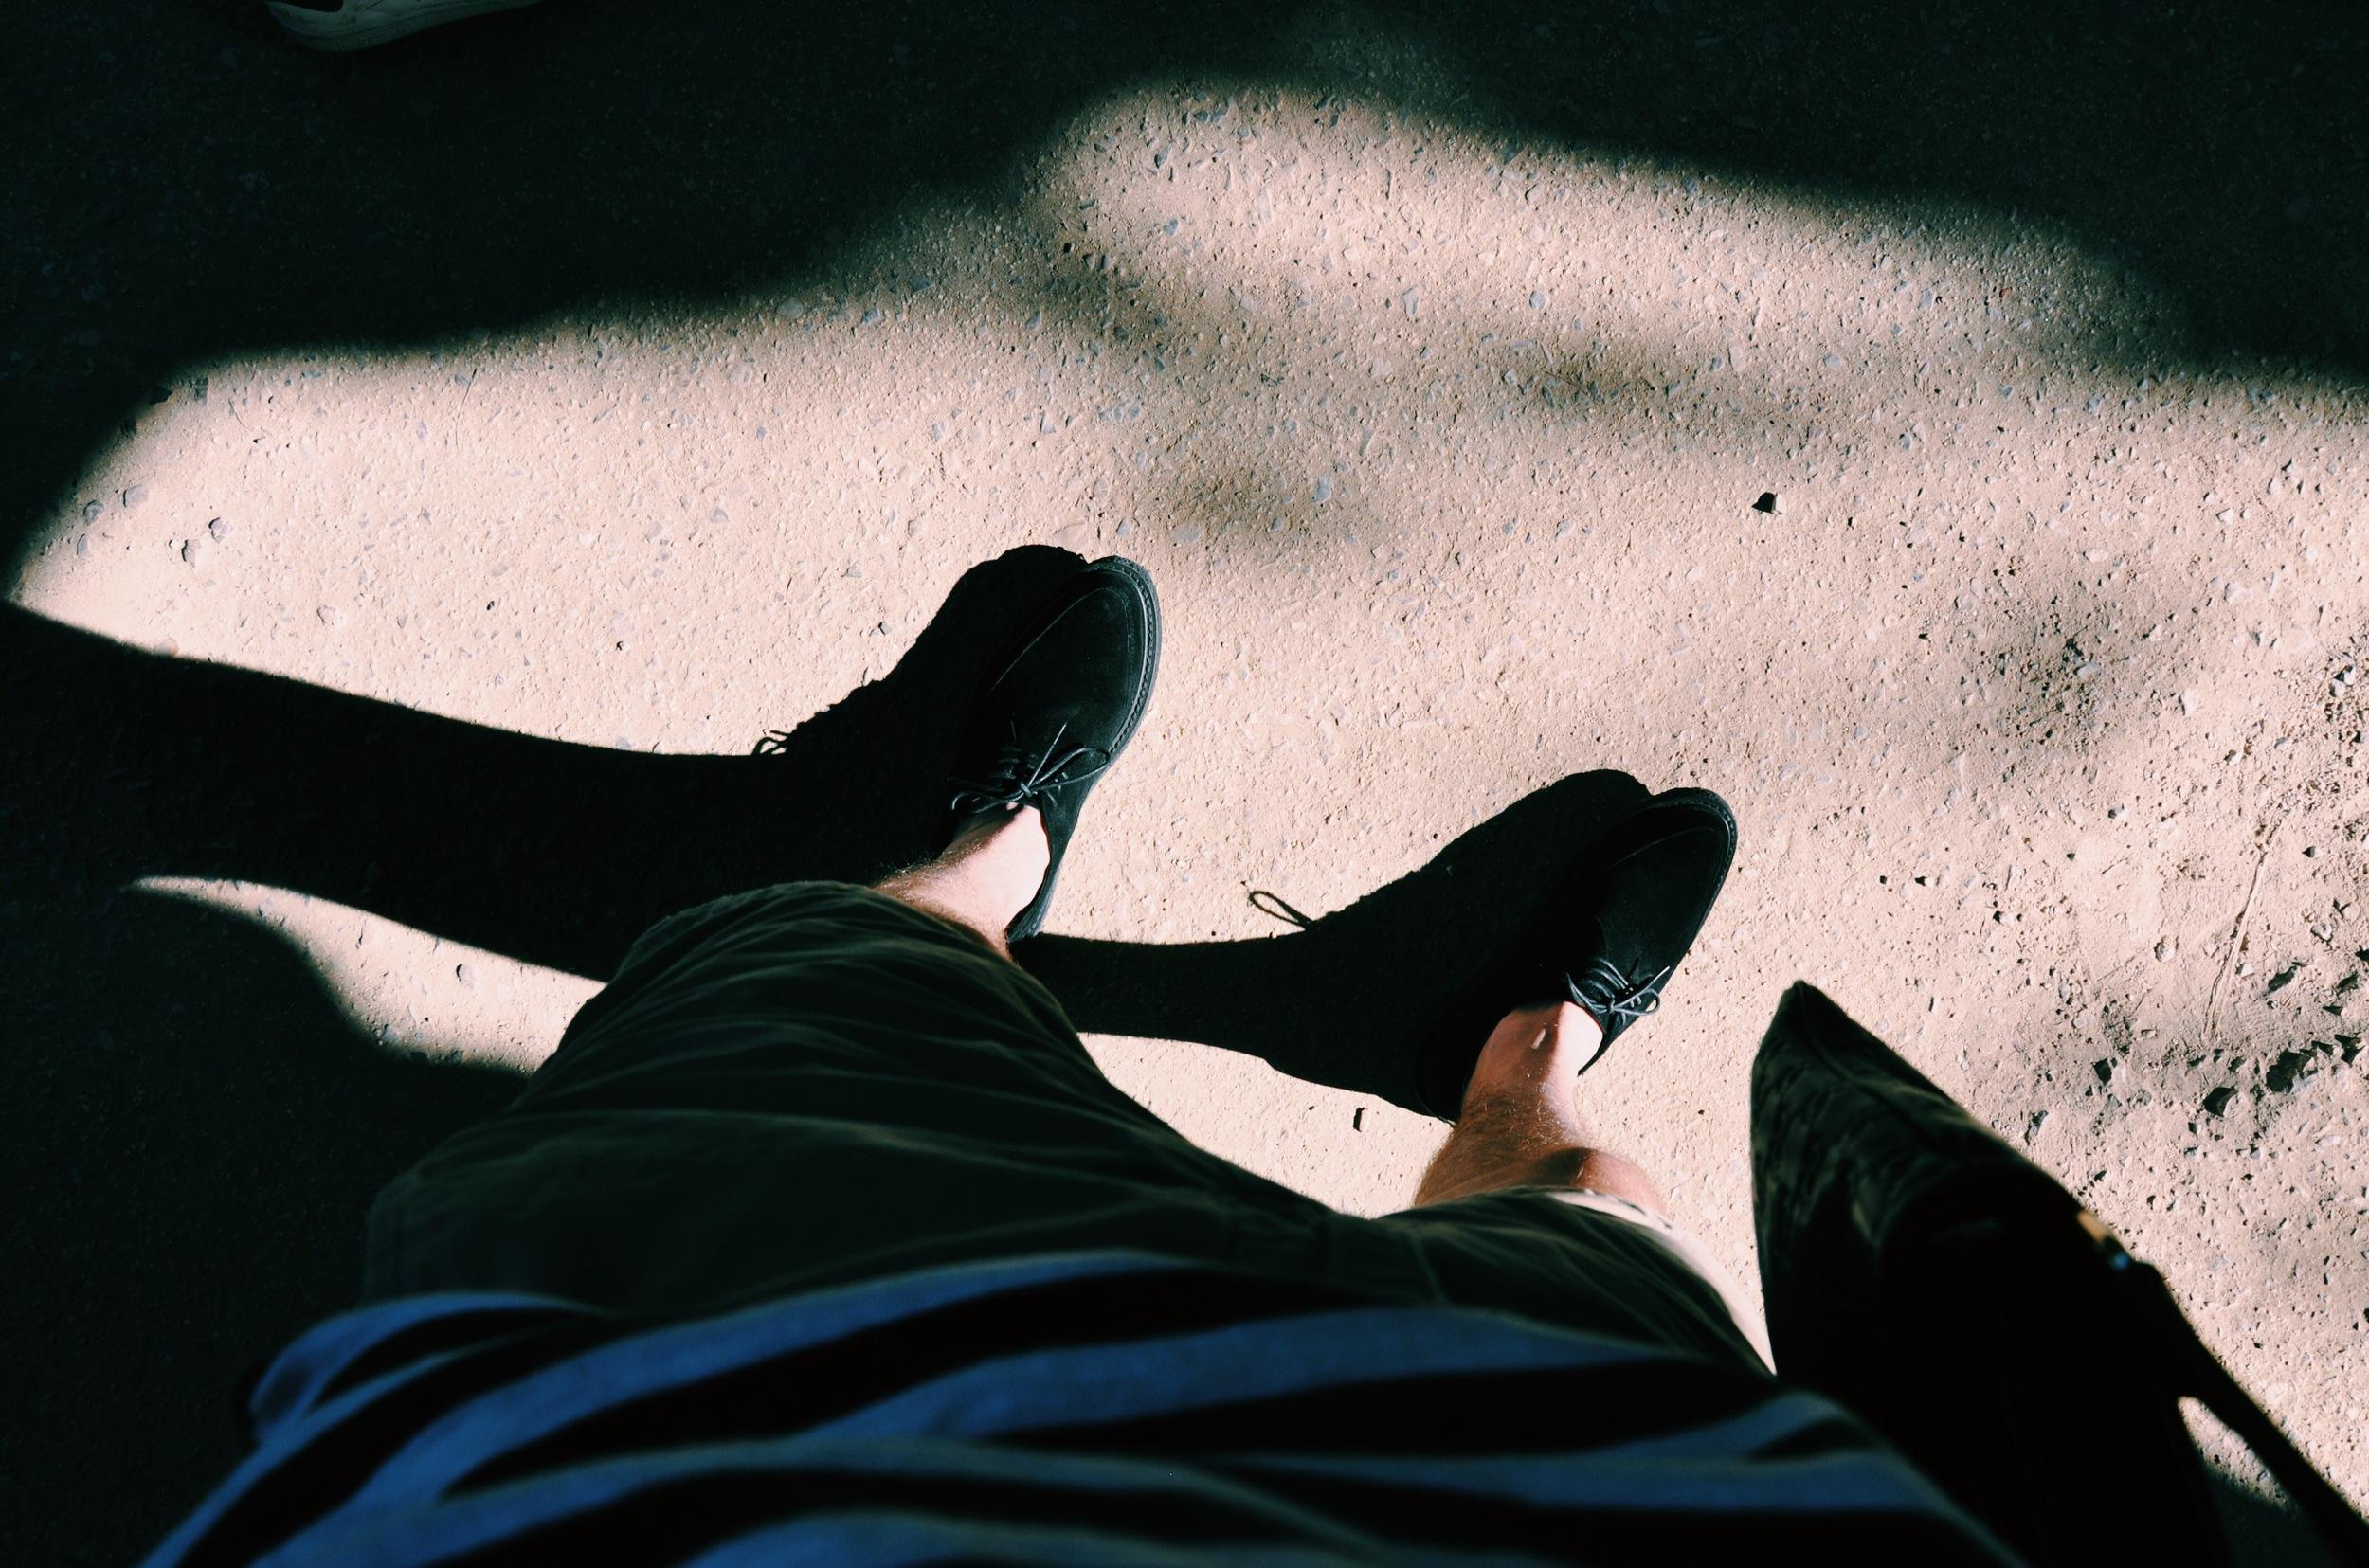 Hot Days